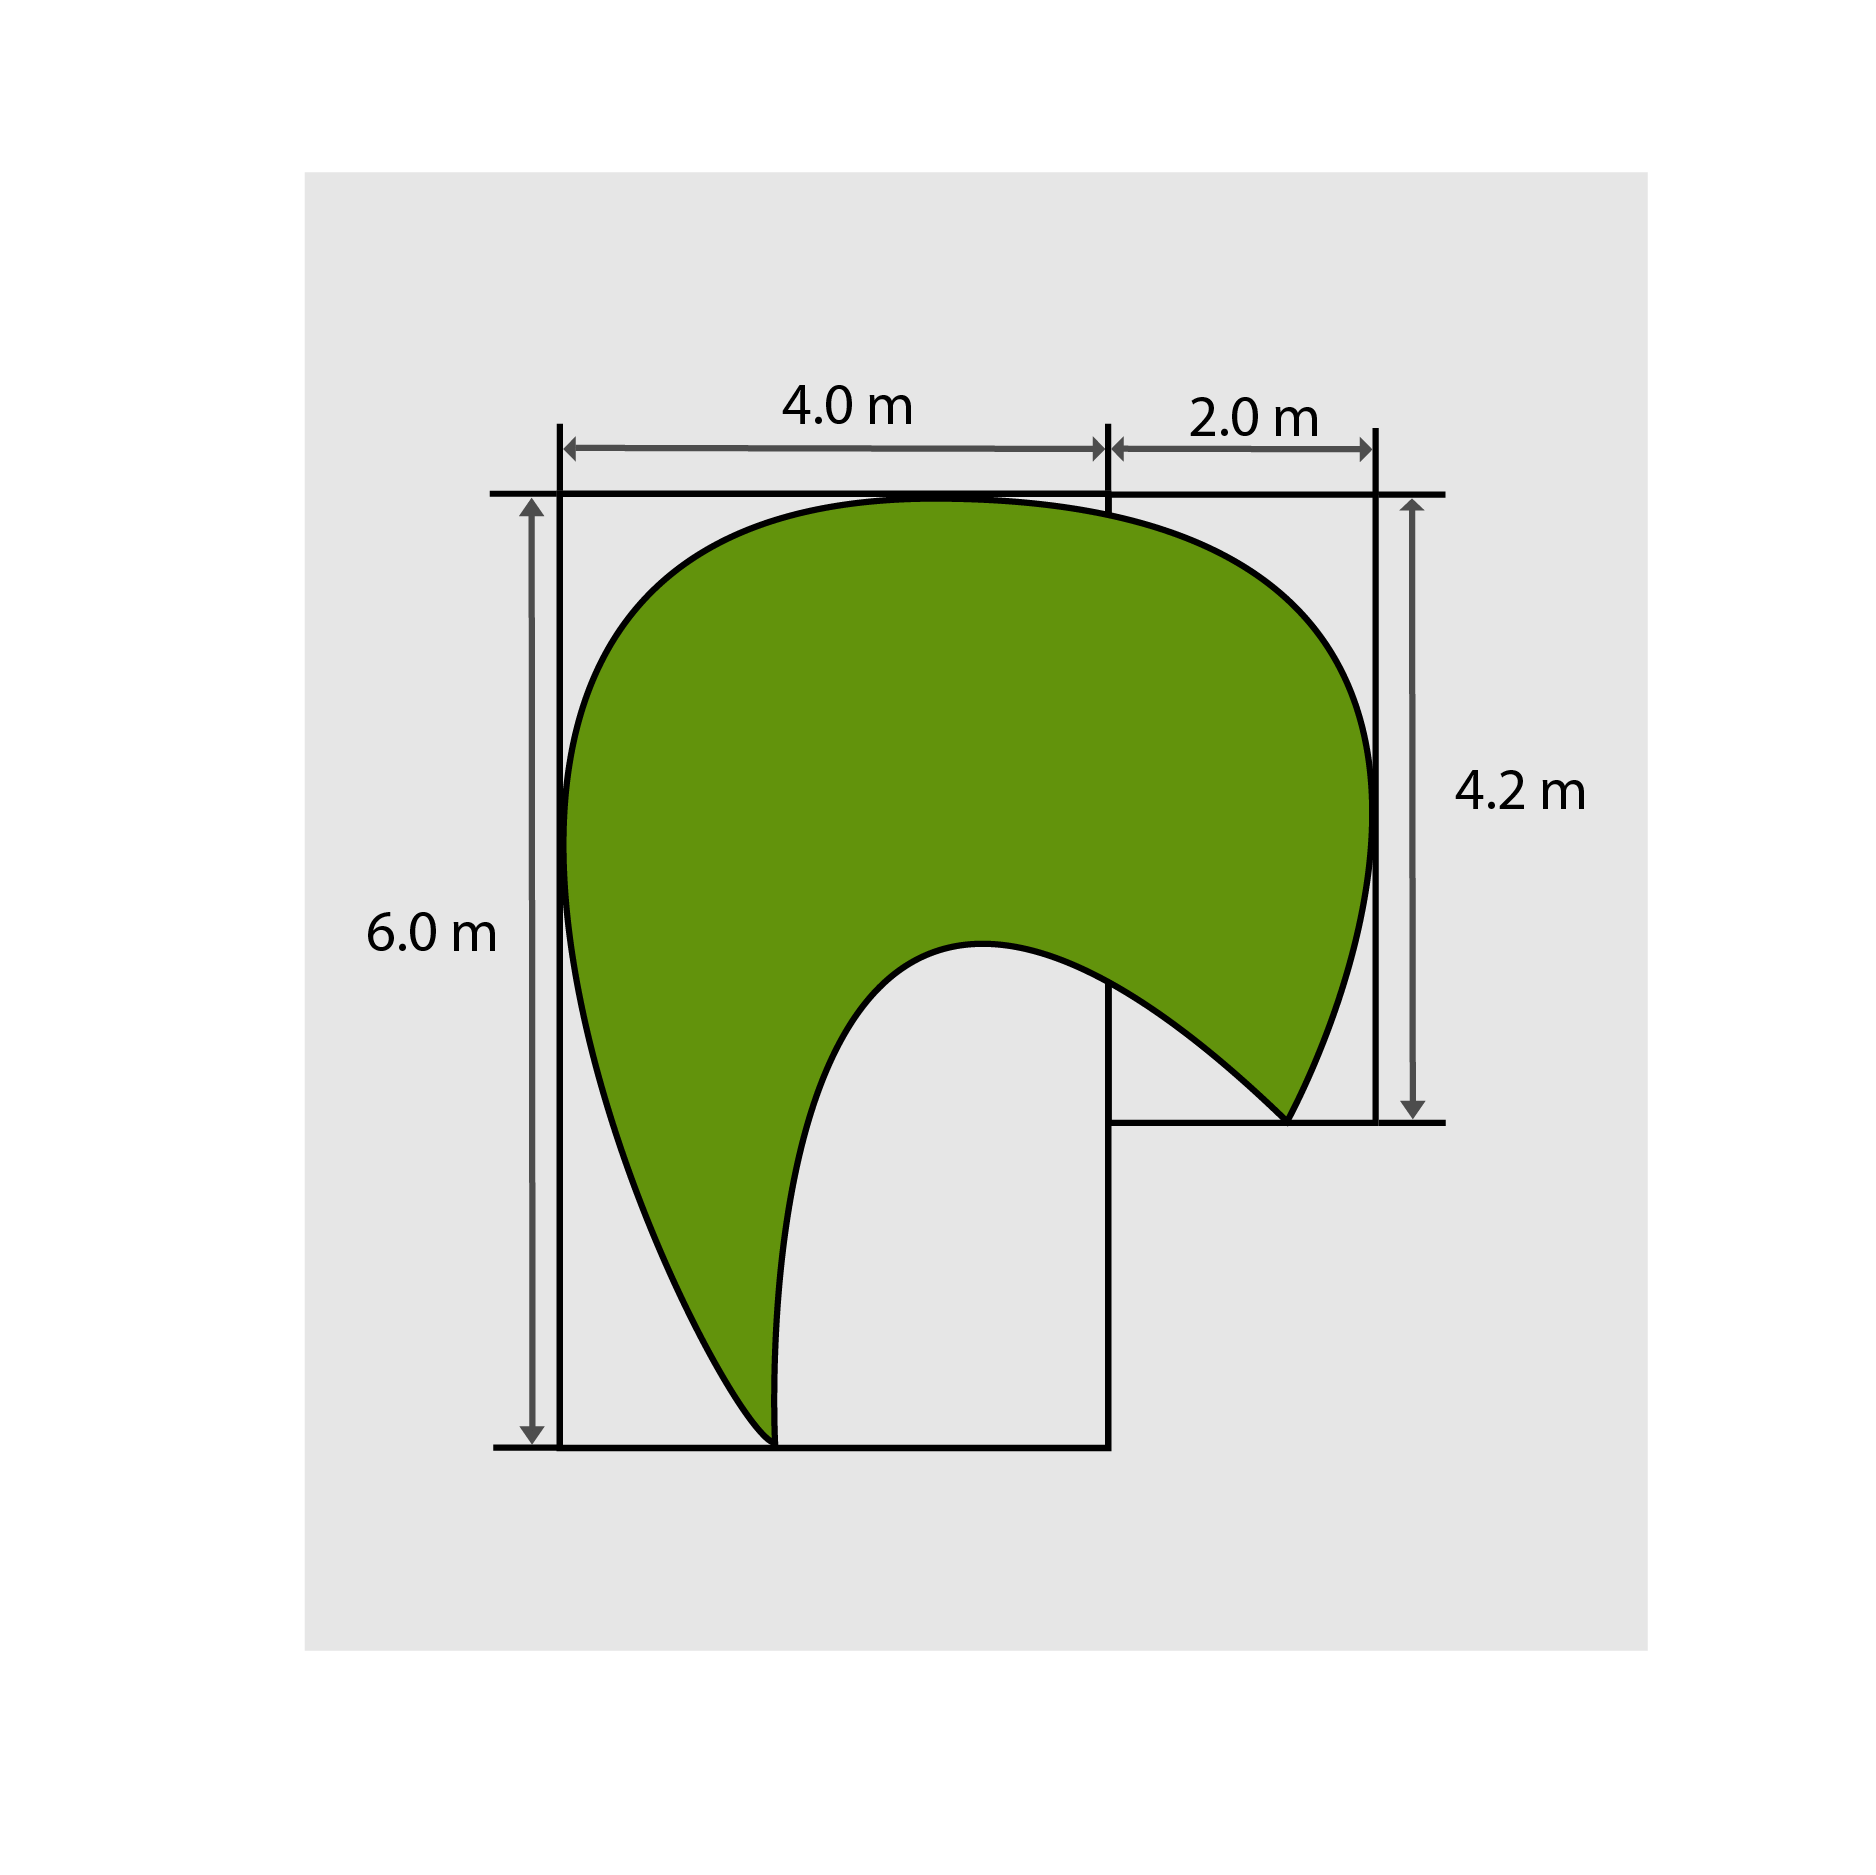 4.0m x 6.0m = 24m² </br> 2.0m x 4.2m = 8.4m² </br> Total = 32.4m² to purchase